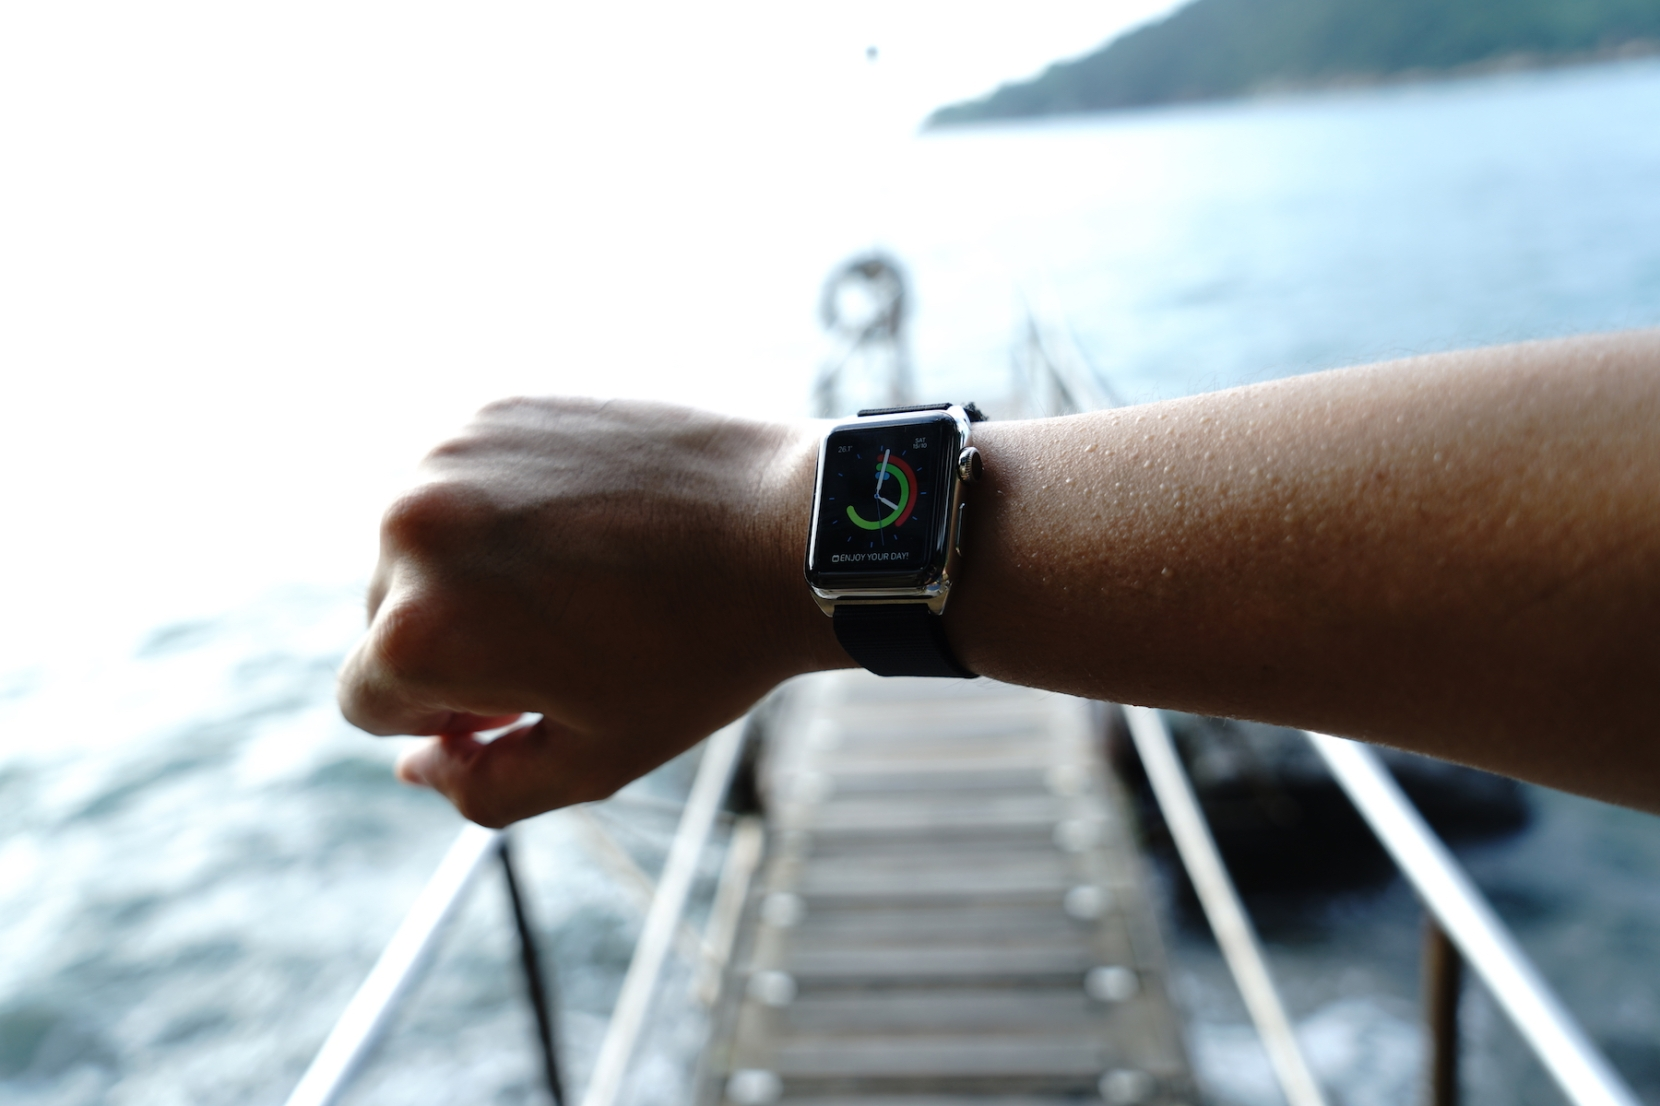 monowear-nylon-active-apple-watch-band-15